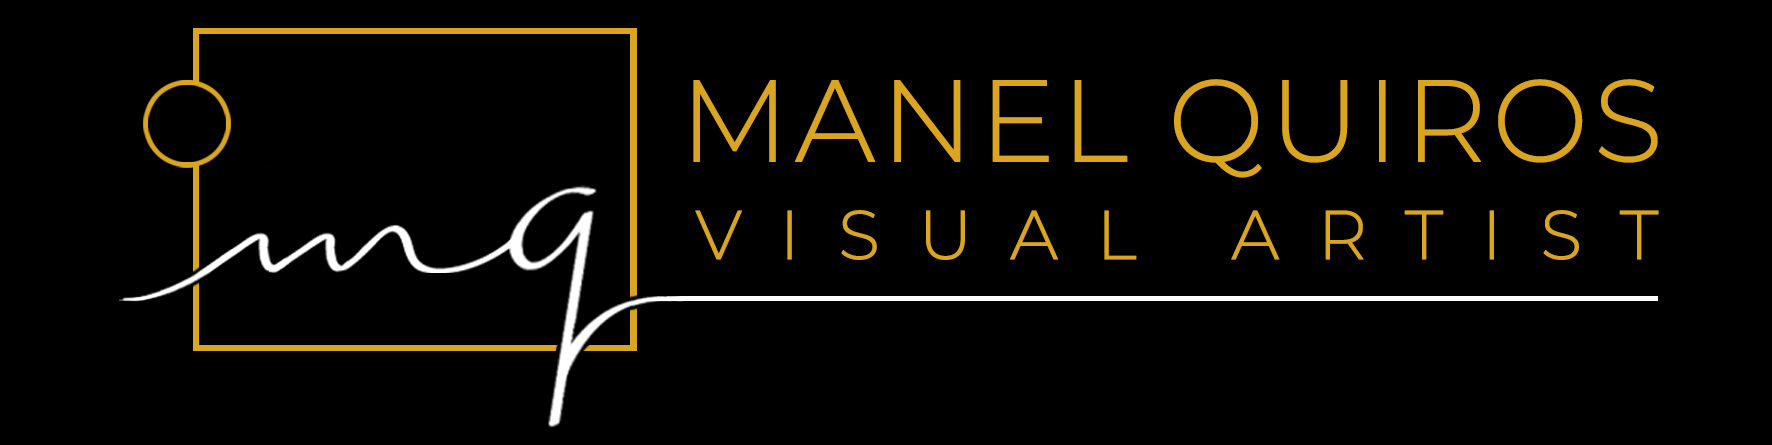 Logo Manel Quiros Visual Artist | Manel Quiros Photography